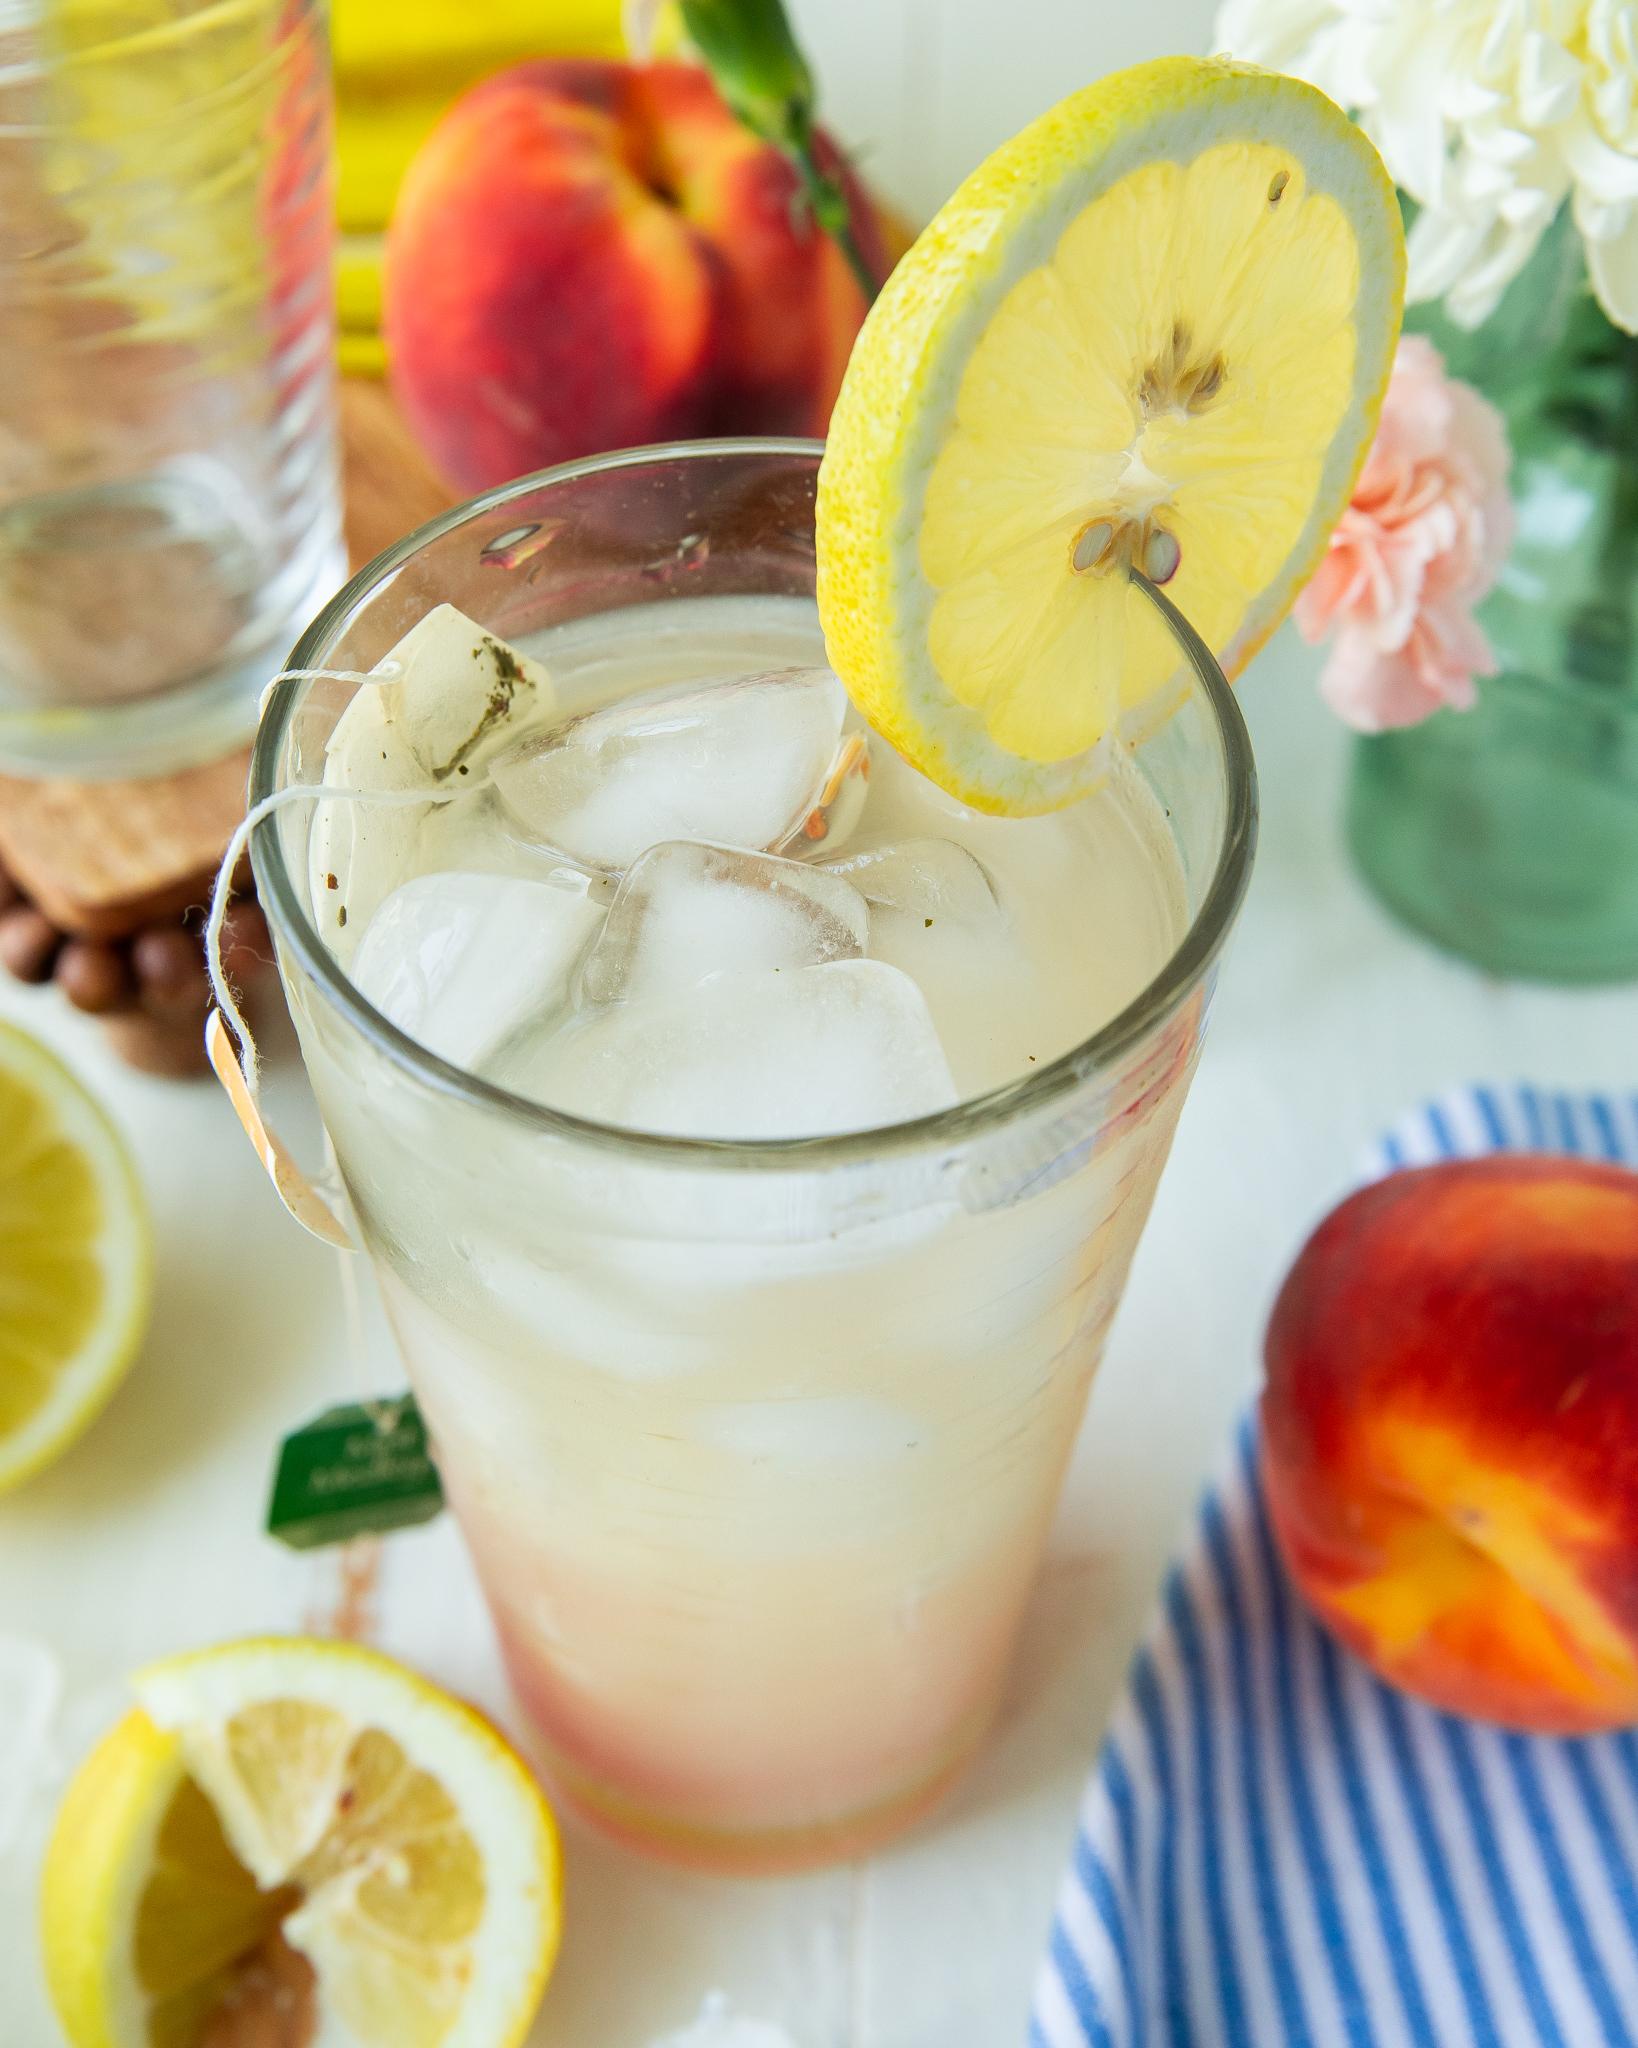 Mint and Peach caffeine-free lemon tea